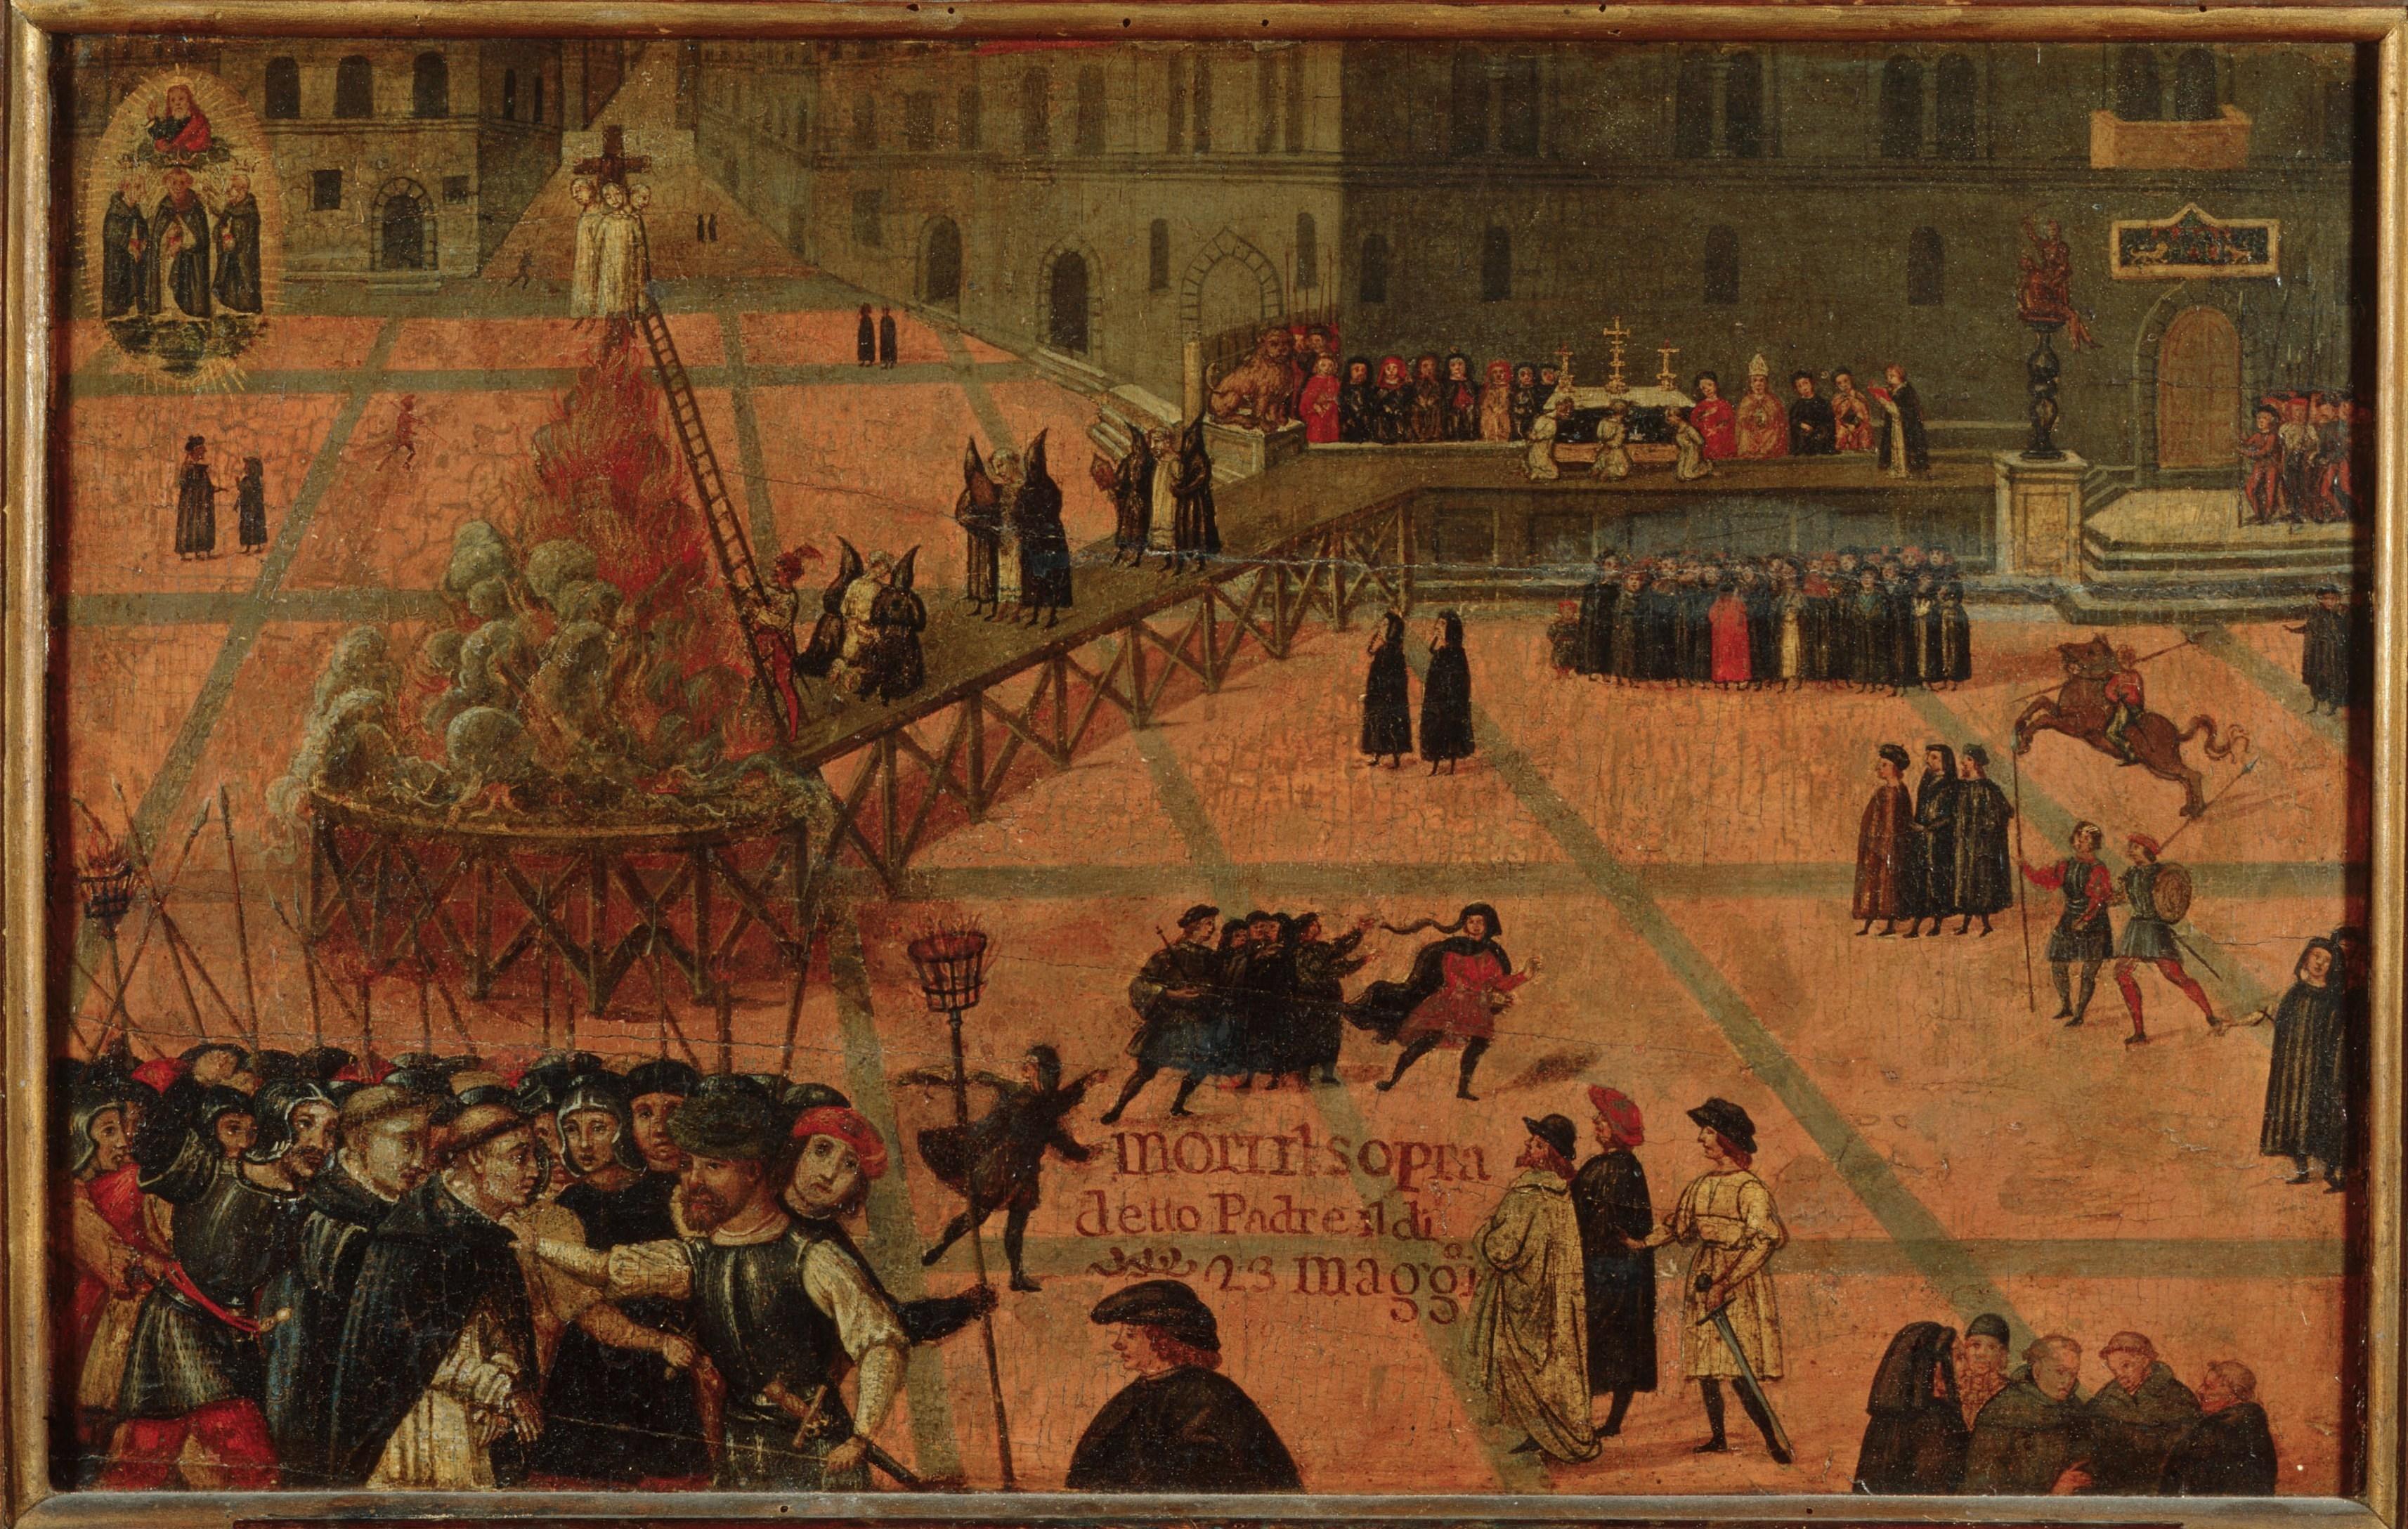 File:Filippo Dolciati (1443 - 1519) Execution of Girolamo Savonarola. 1498,